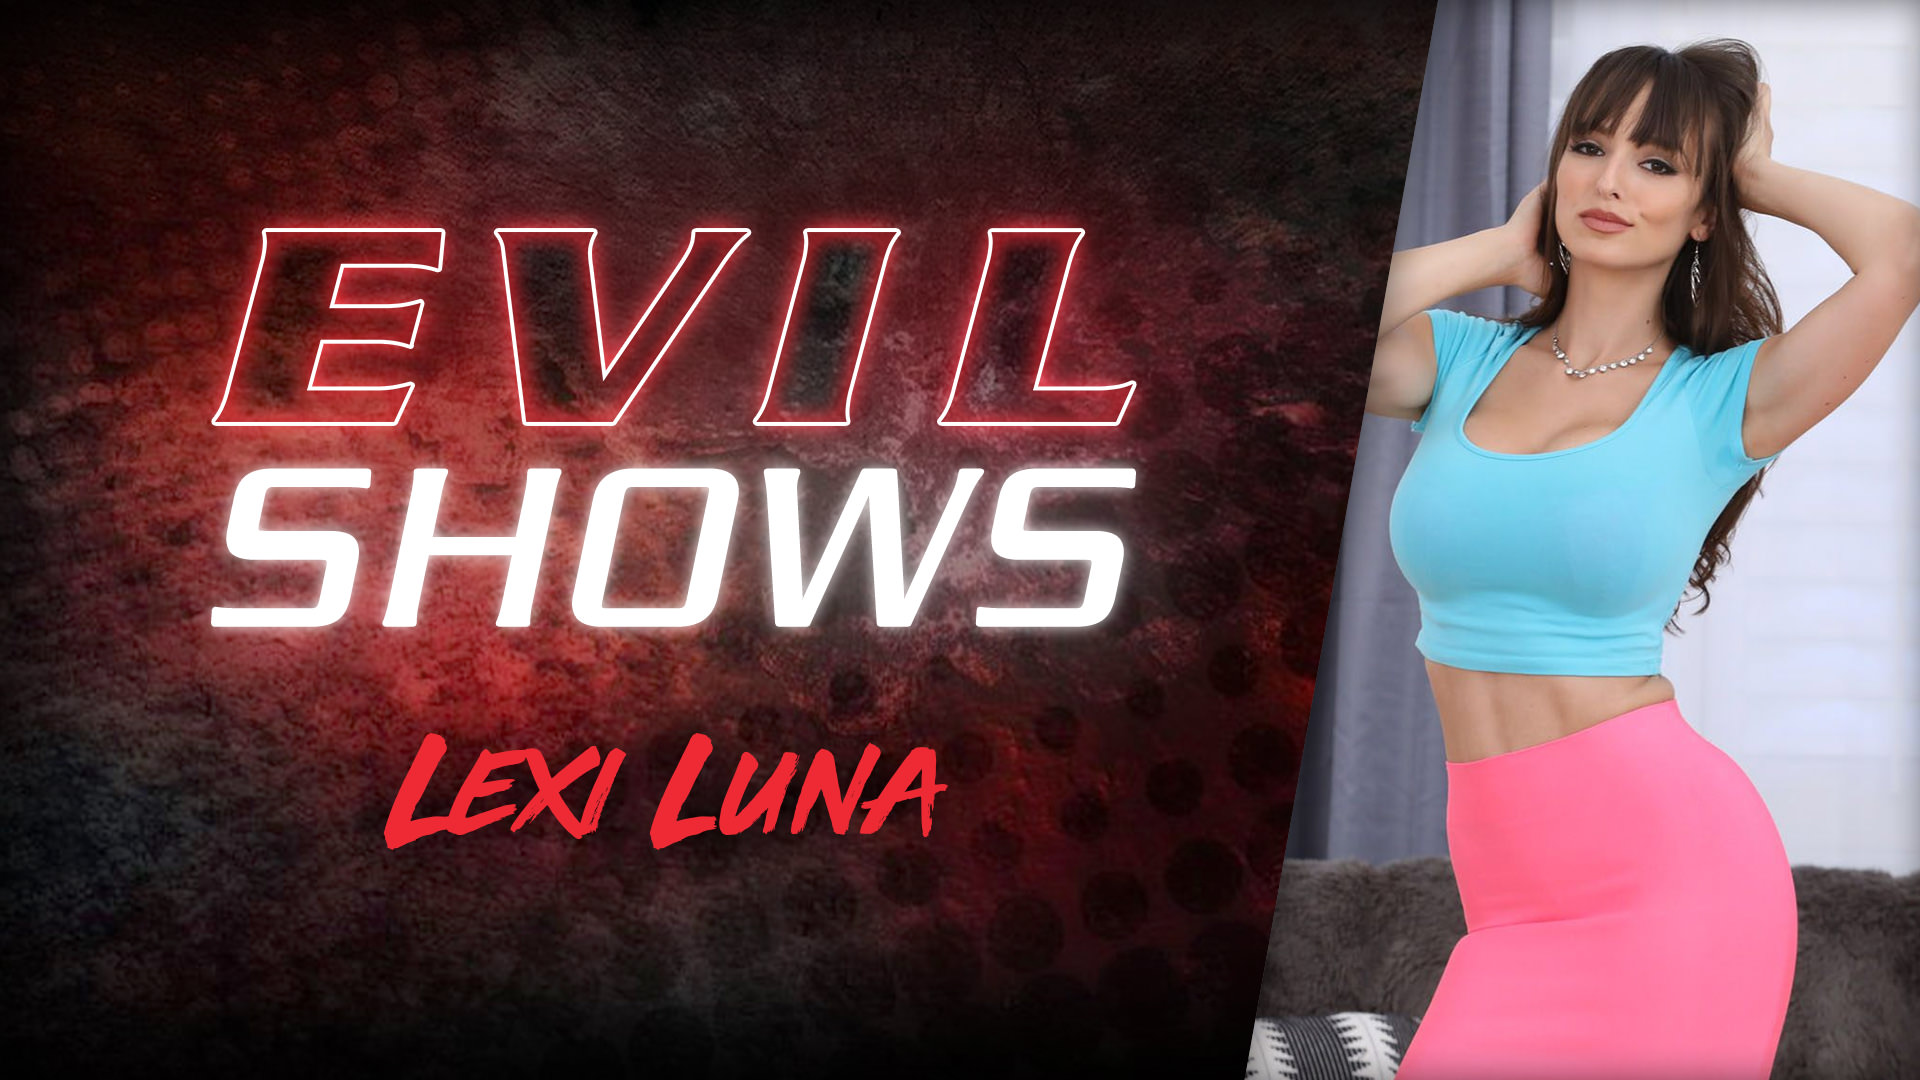 Evil Shows - Lexi Luna Scena 1